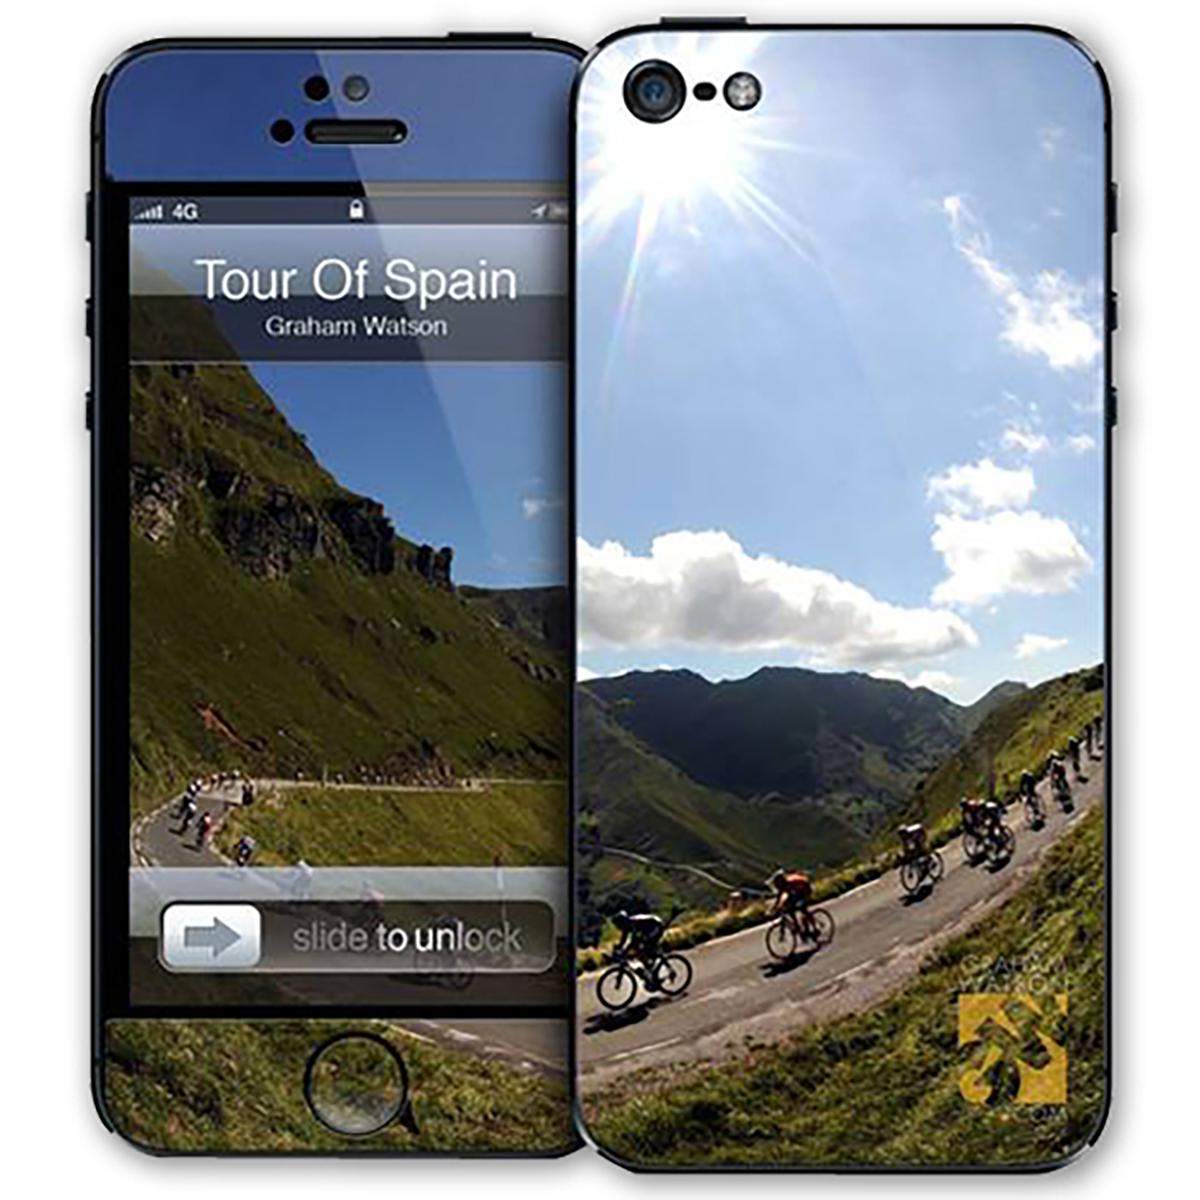 Graham Watson Tour Of Spain iPhone 5 Skin